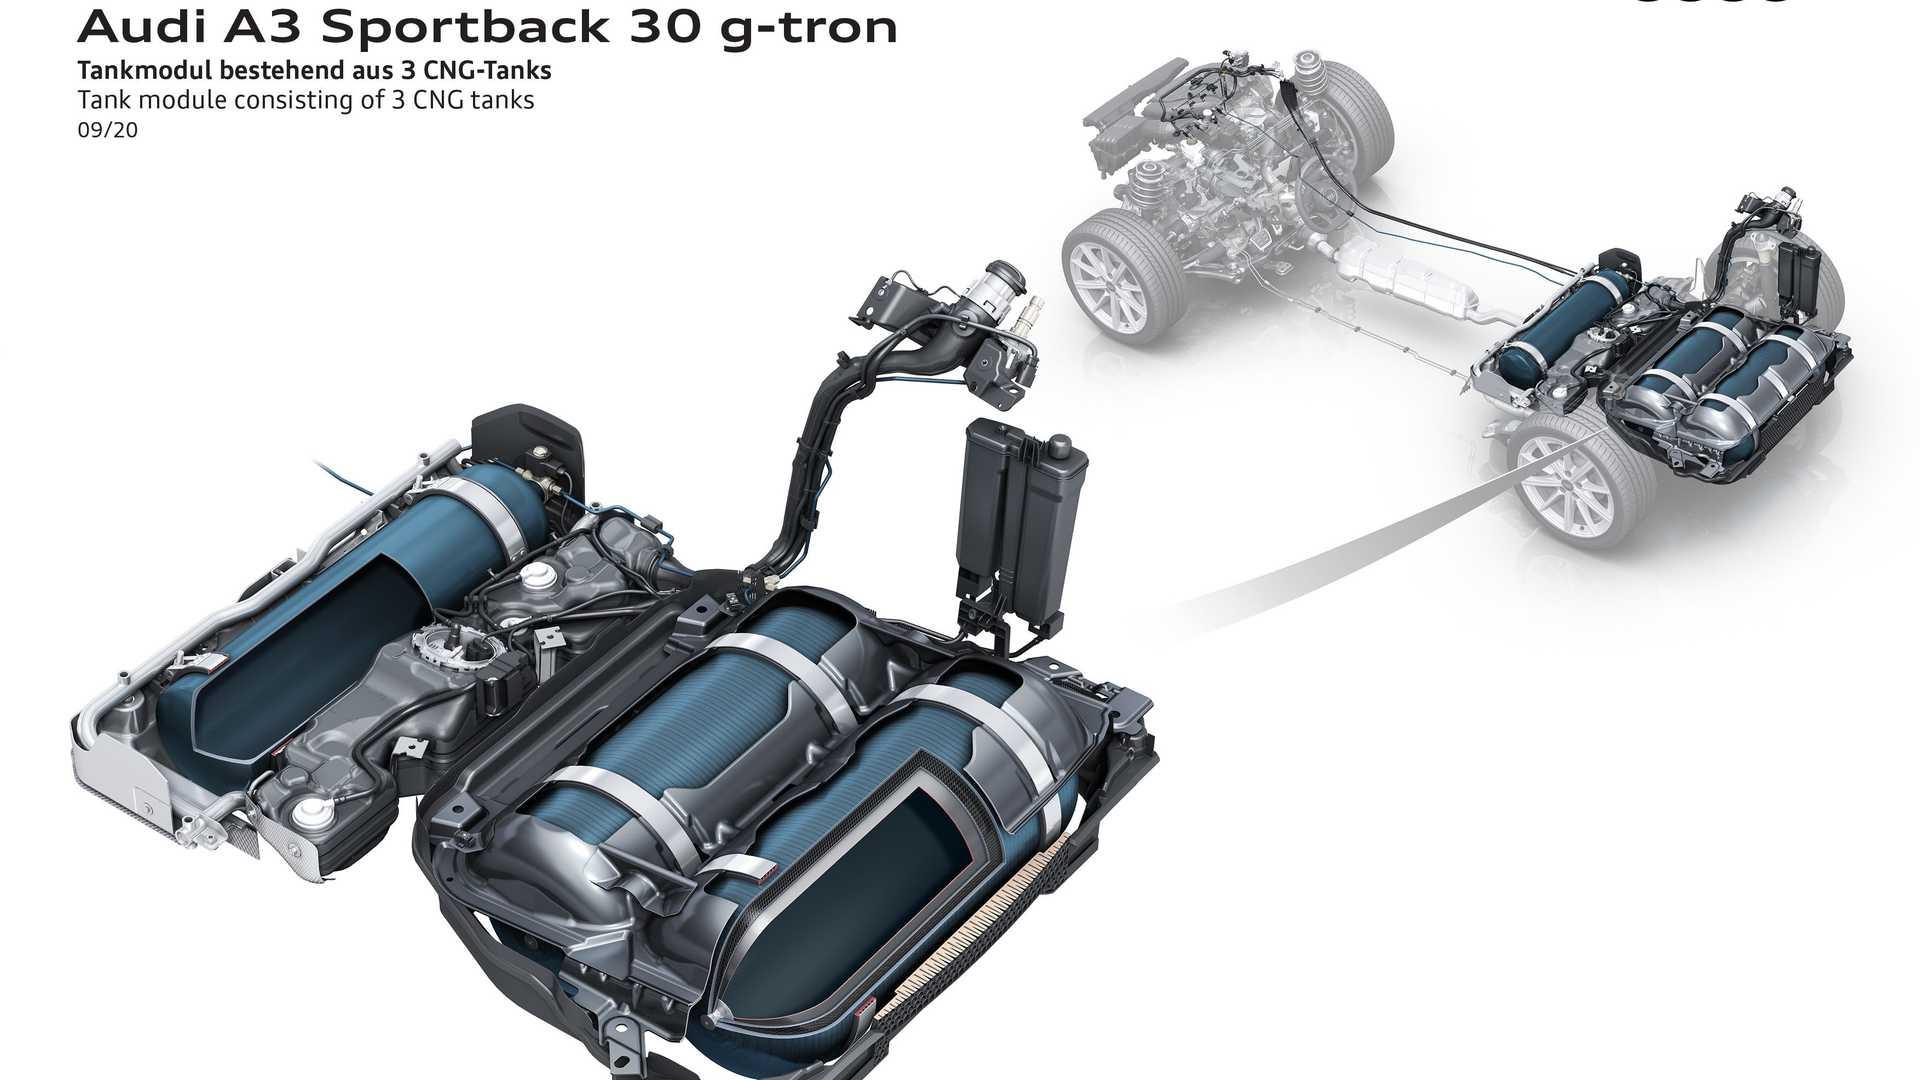 2020 Audi A3 Sportback 30 G